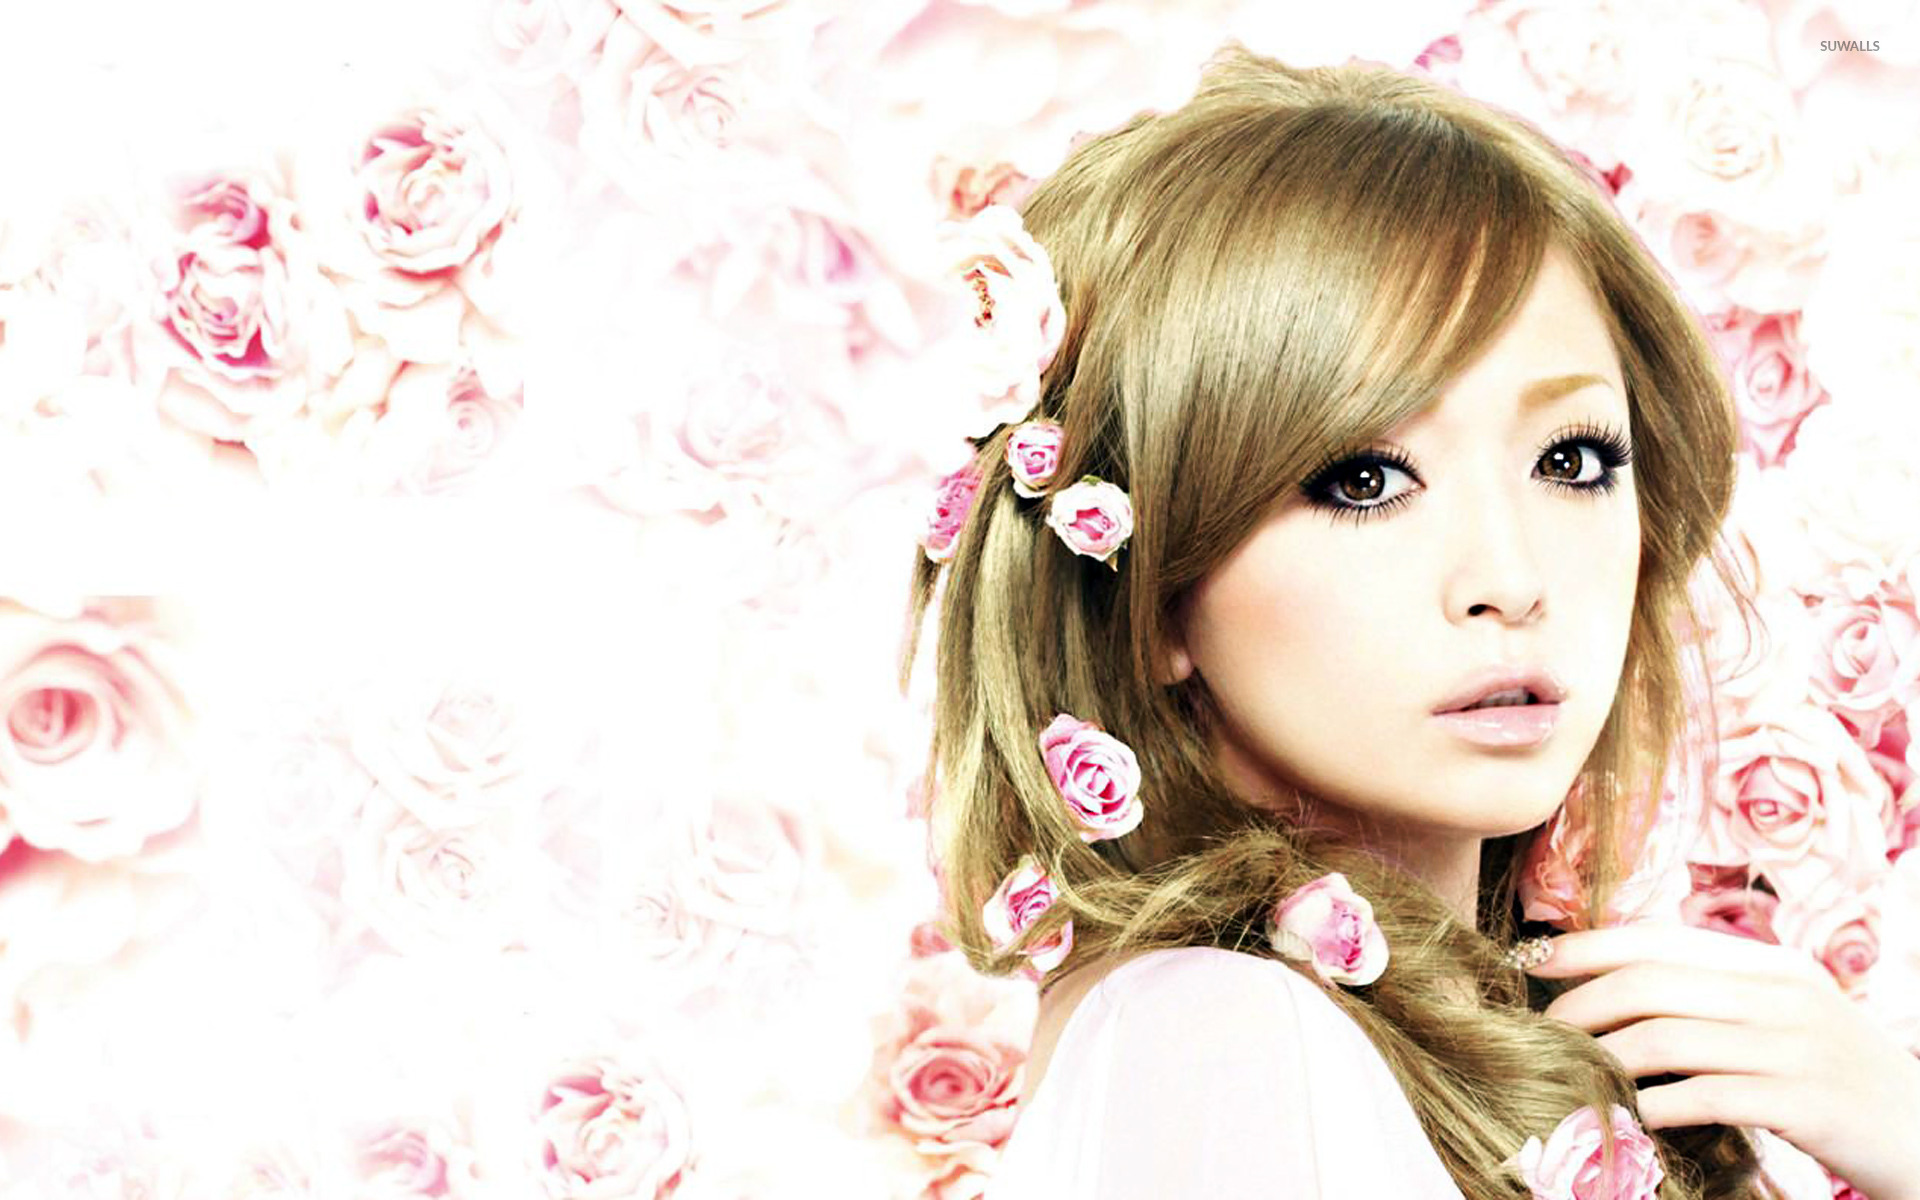 Ayumi Hamasaki Wallpaper Girl Wallpapers 13358